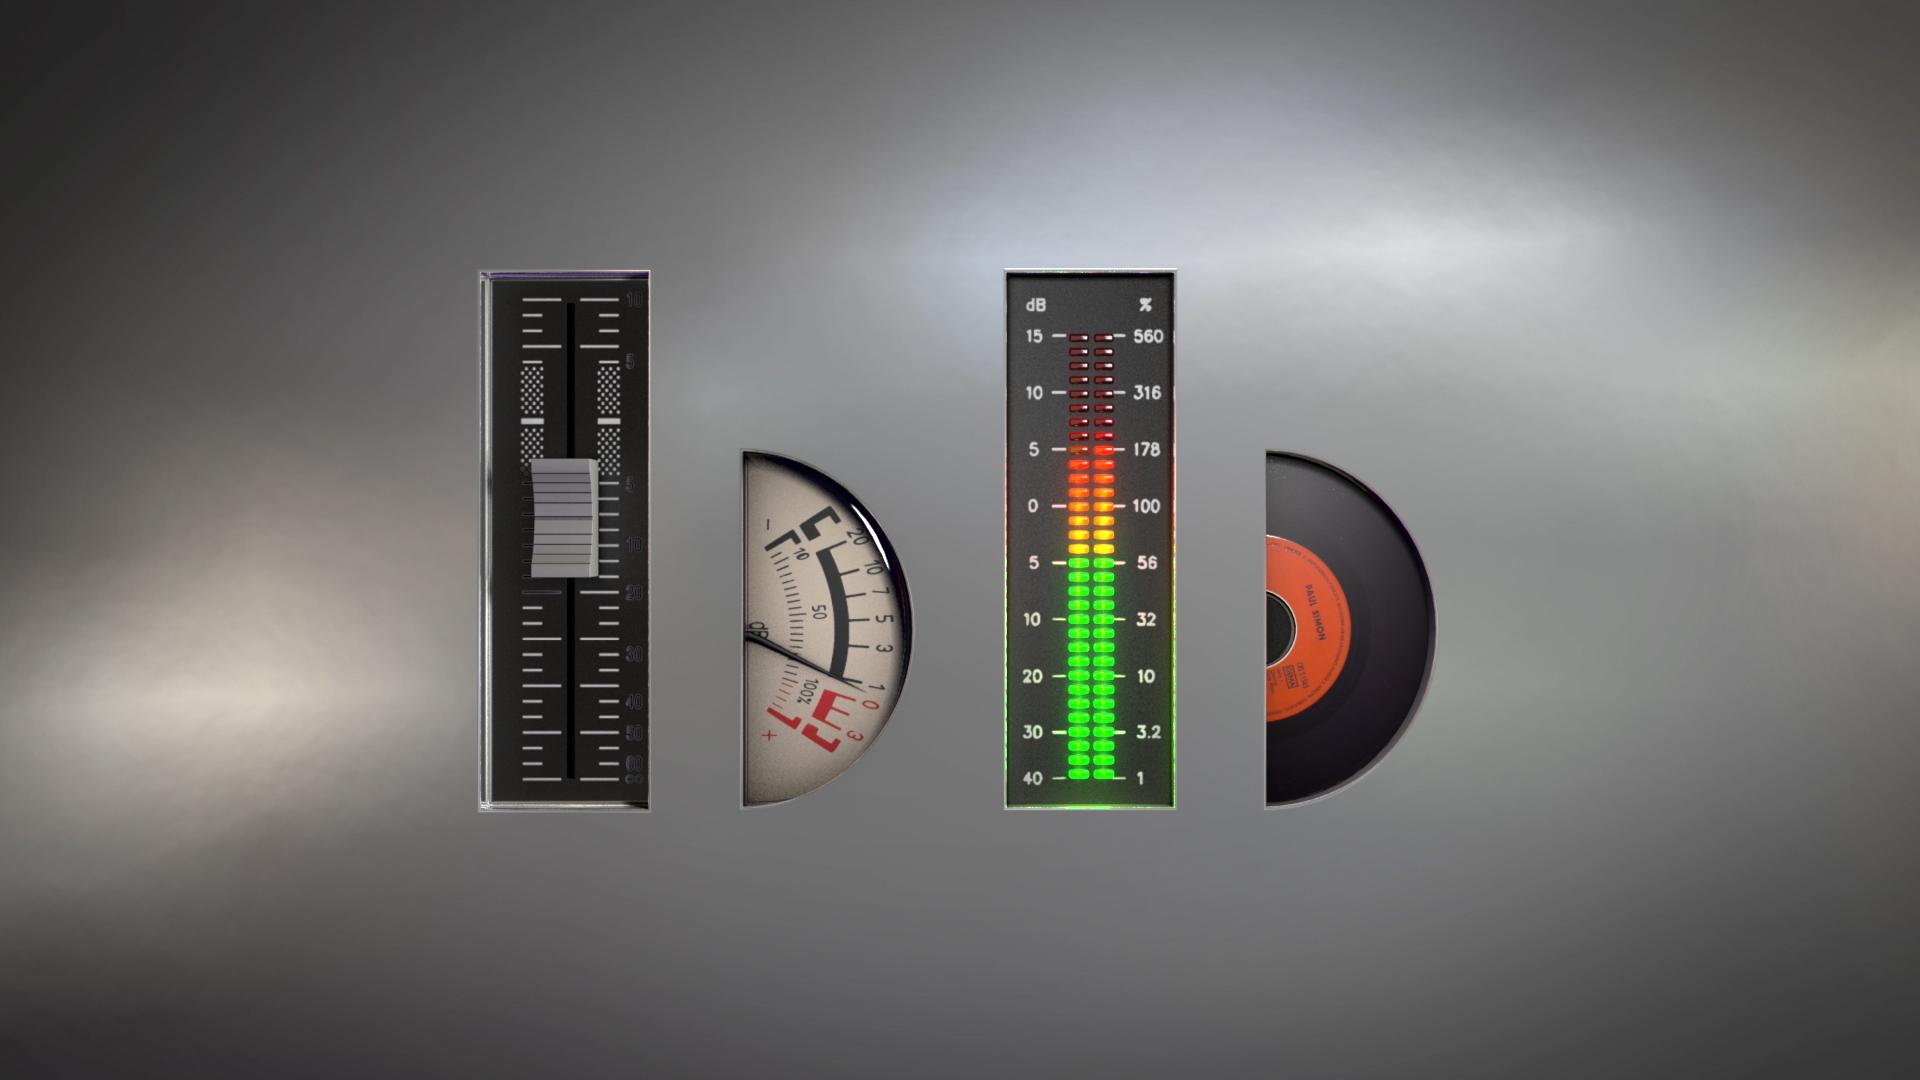 Bom Bom logo stylized to look like an audio engineer's console